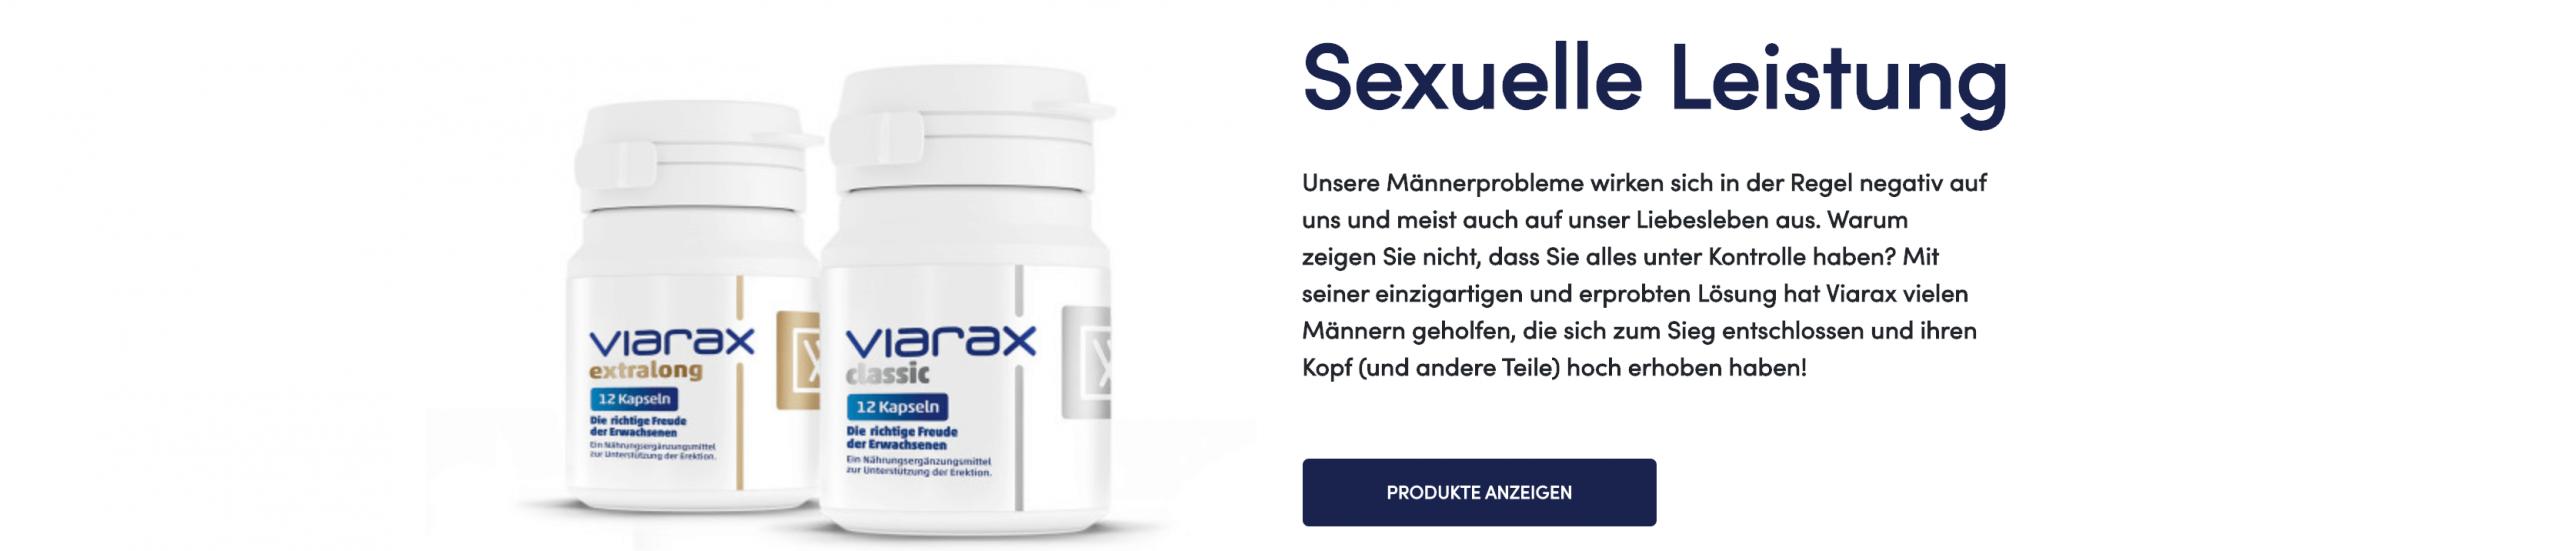 Viarax Homepage